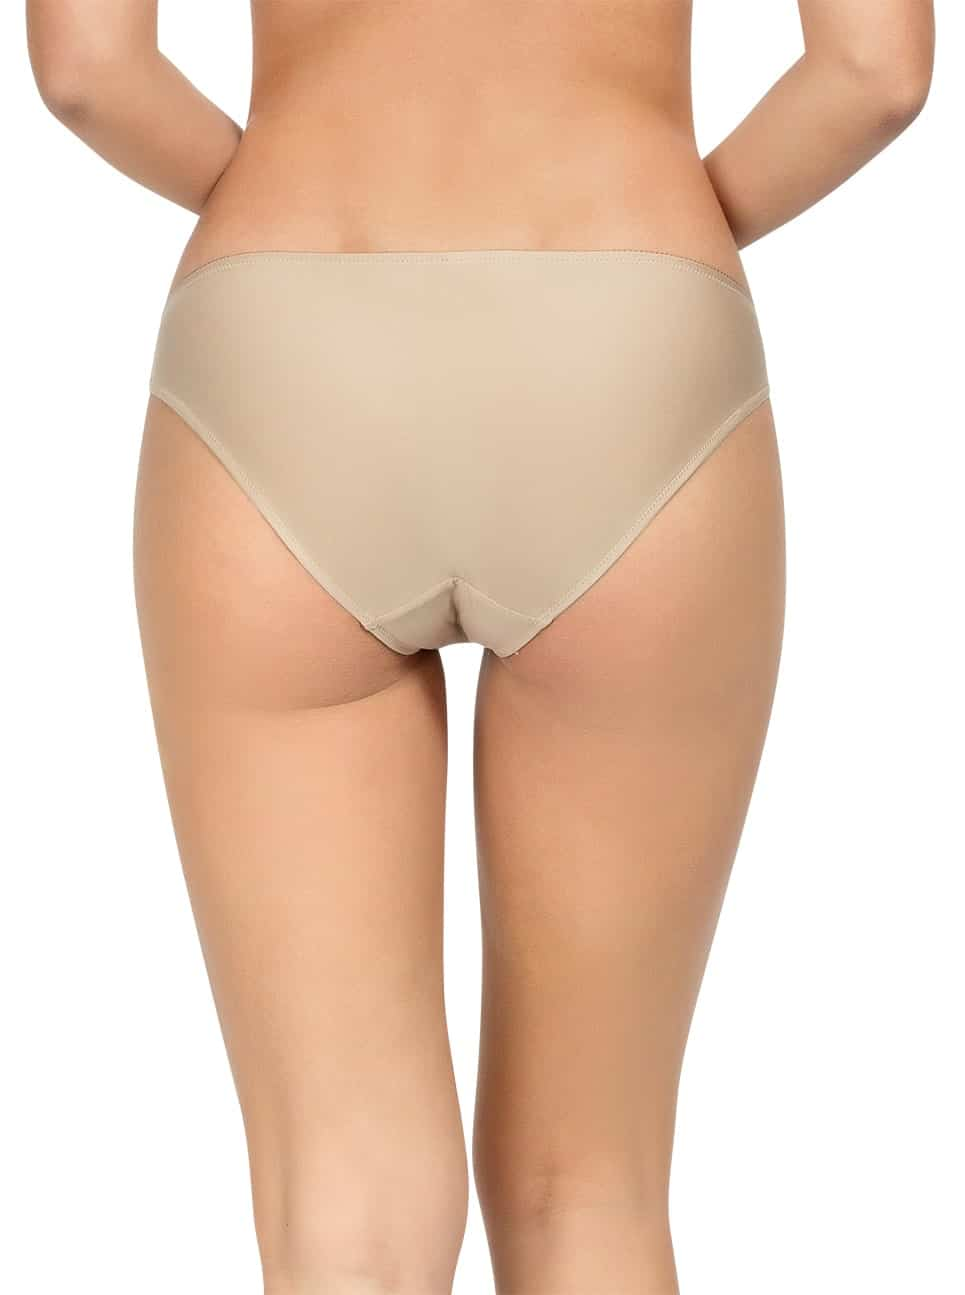 Allure Bikini - European Nude - A1493